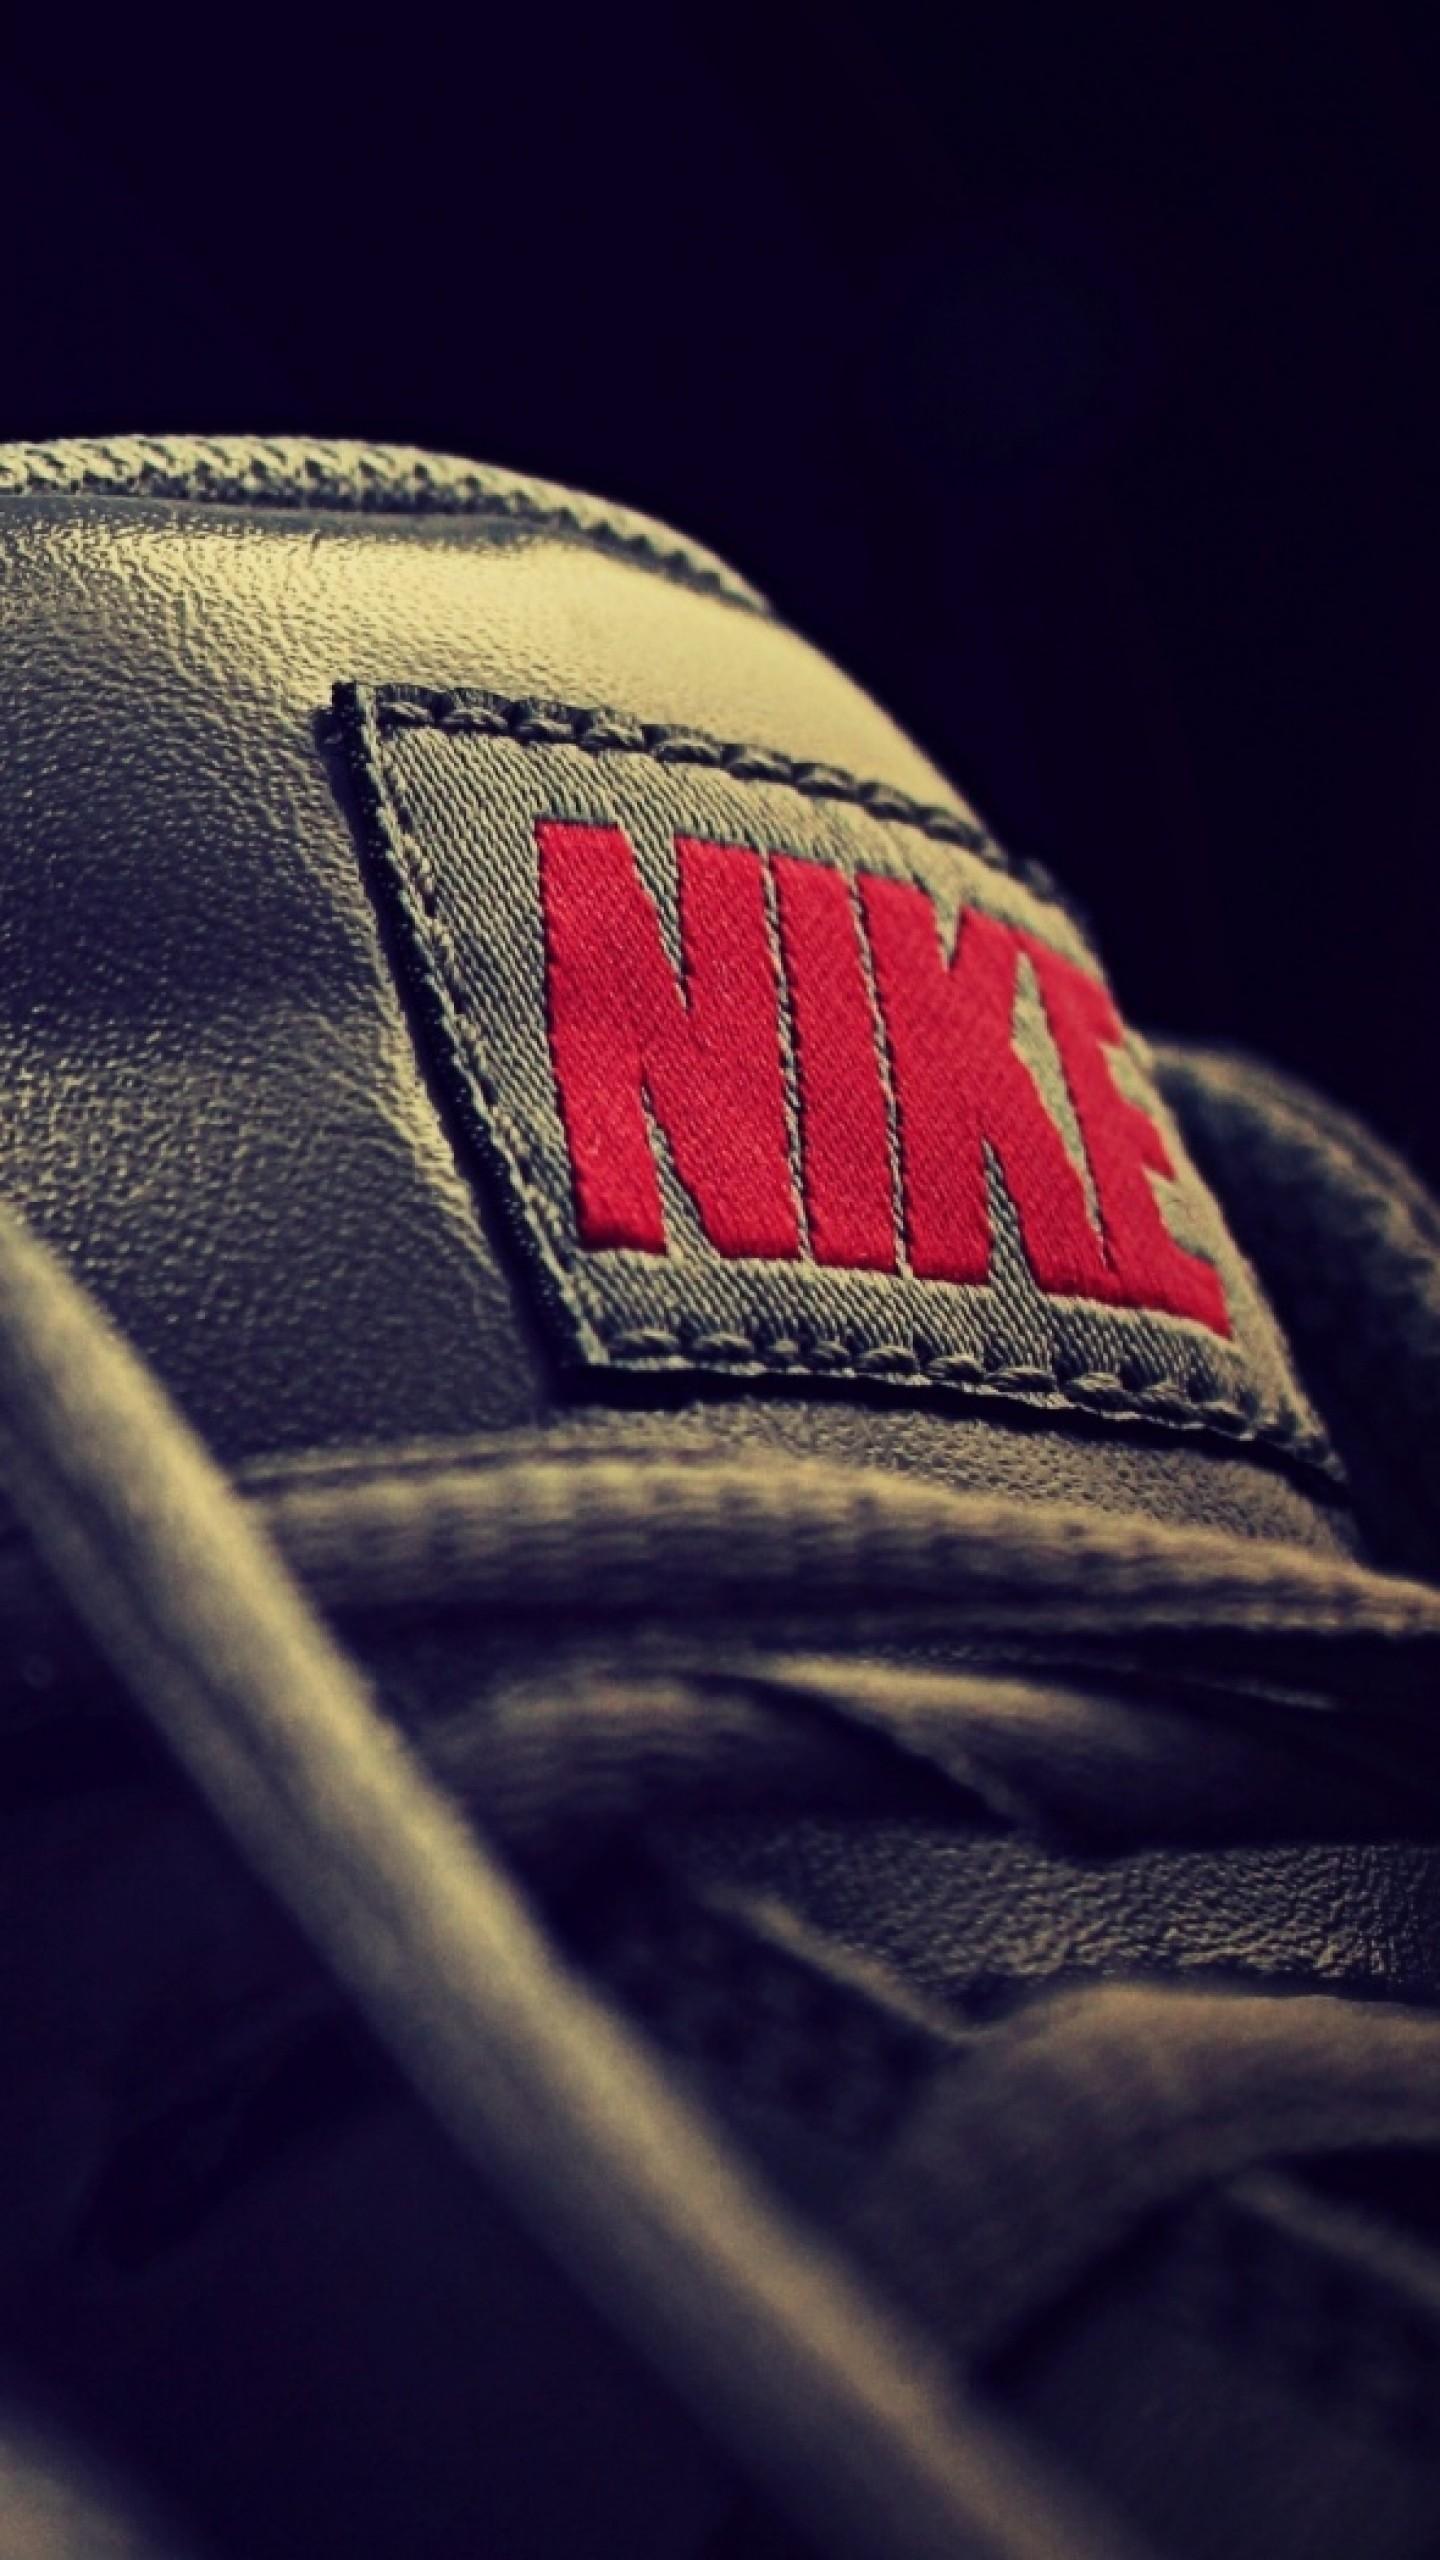 Preview wallpaper nike, sneakers, shoes, logo 1440×2560